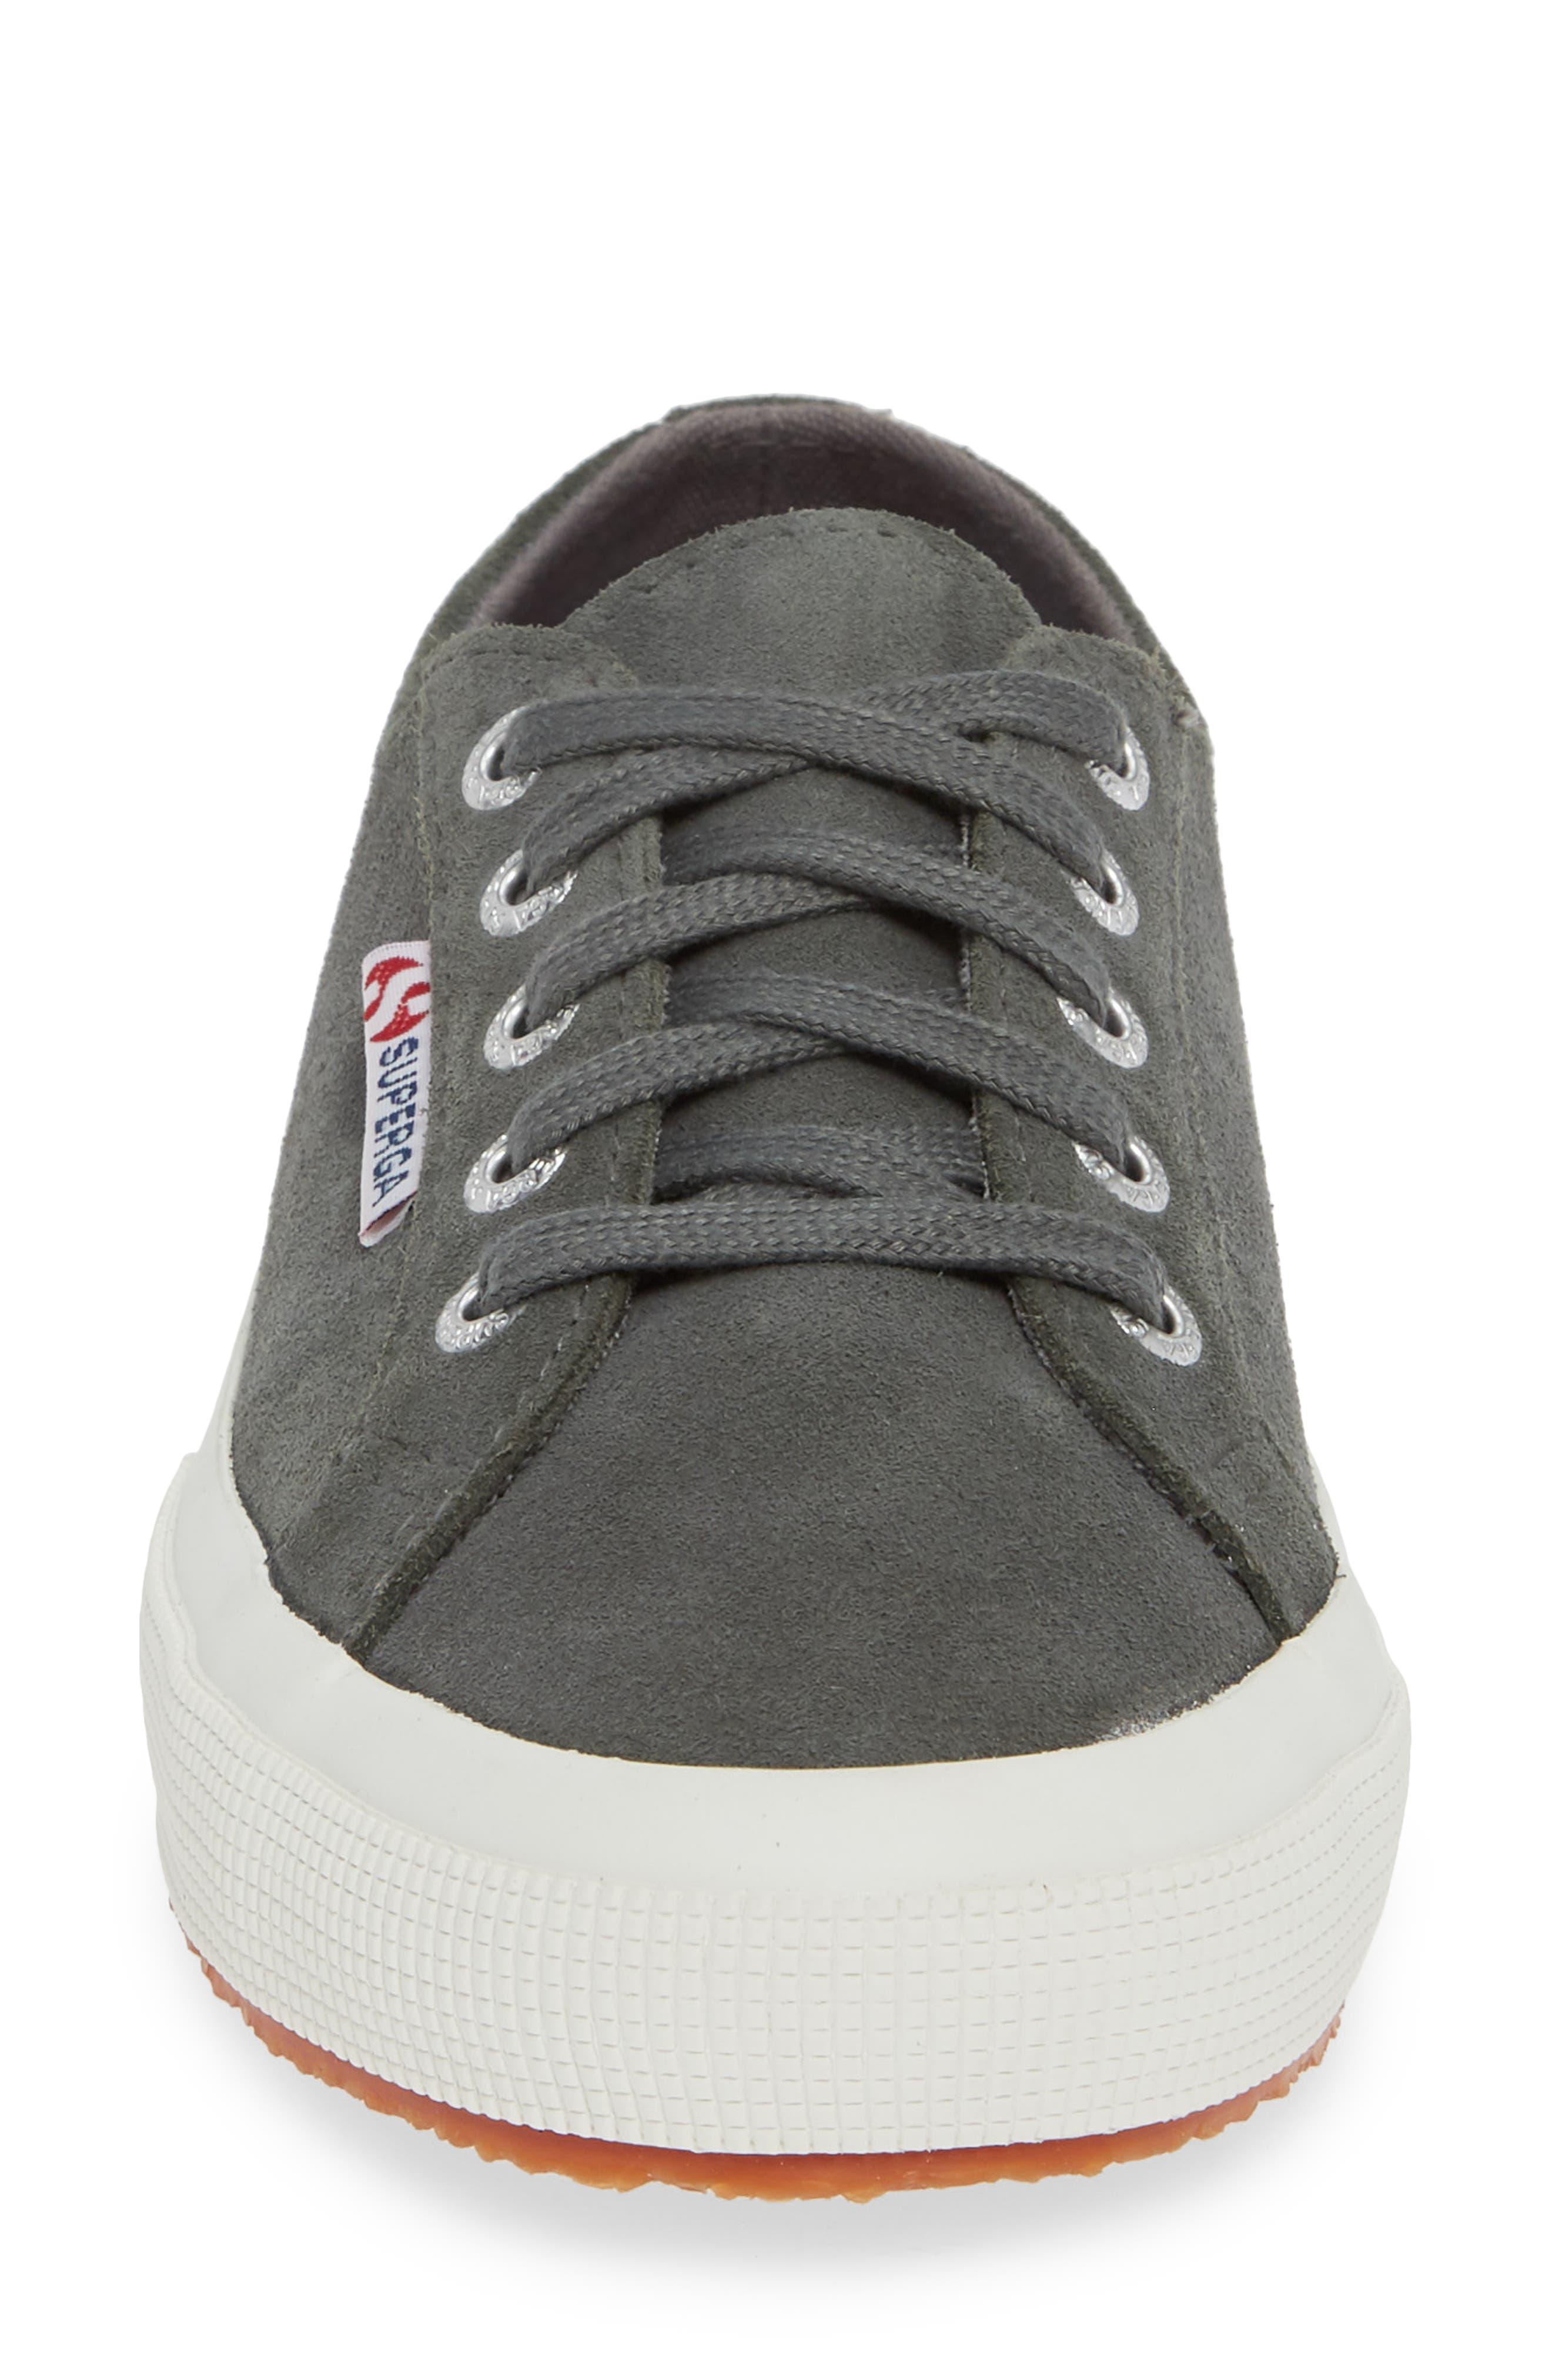 2750 Suecotw Low Top Sneaker,                             Alternate thumbnail 4, color,                             DARK GREY SUEDE